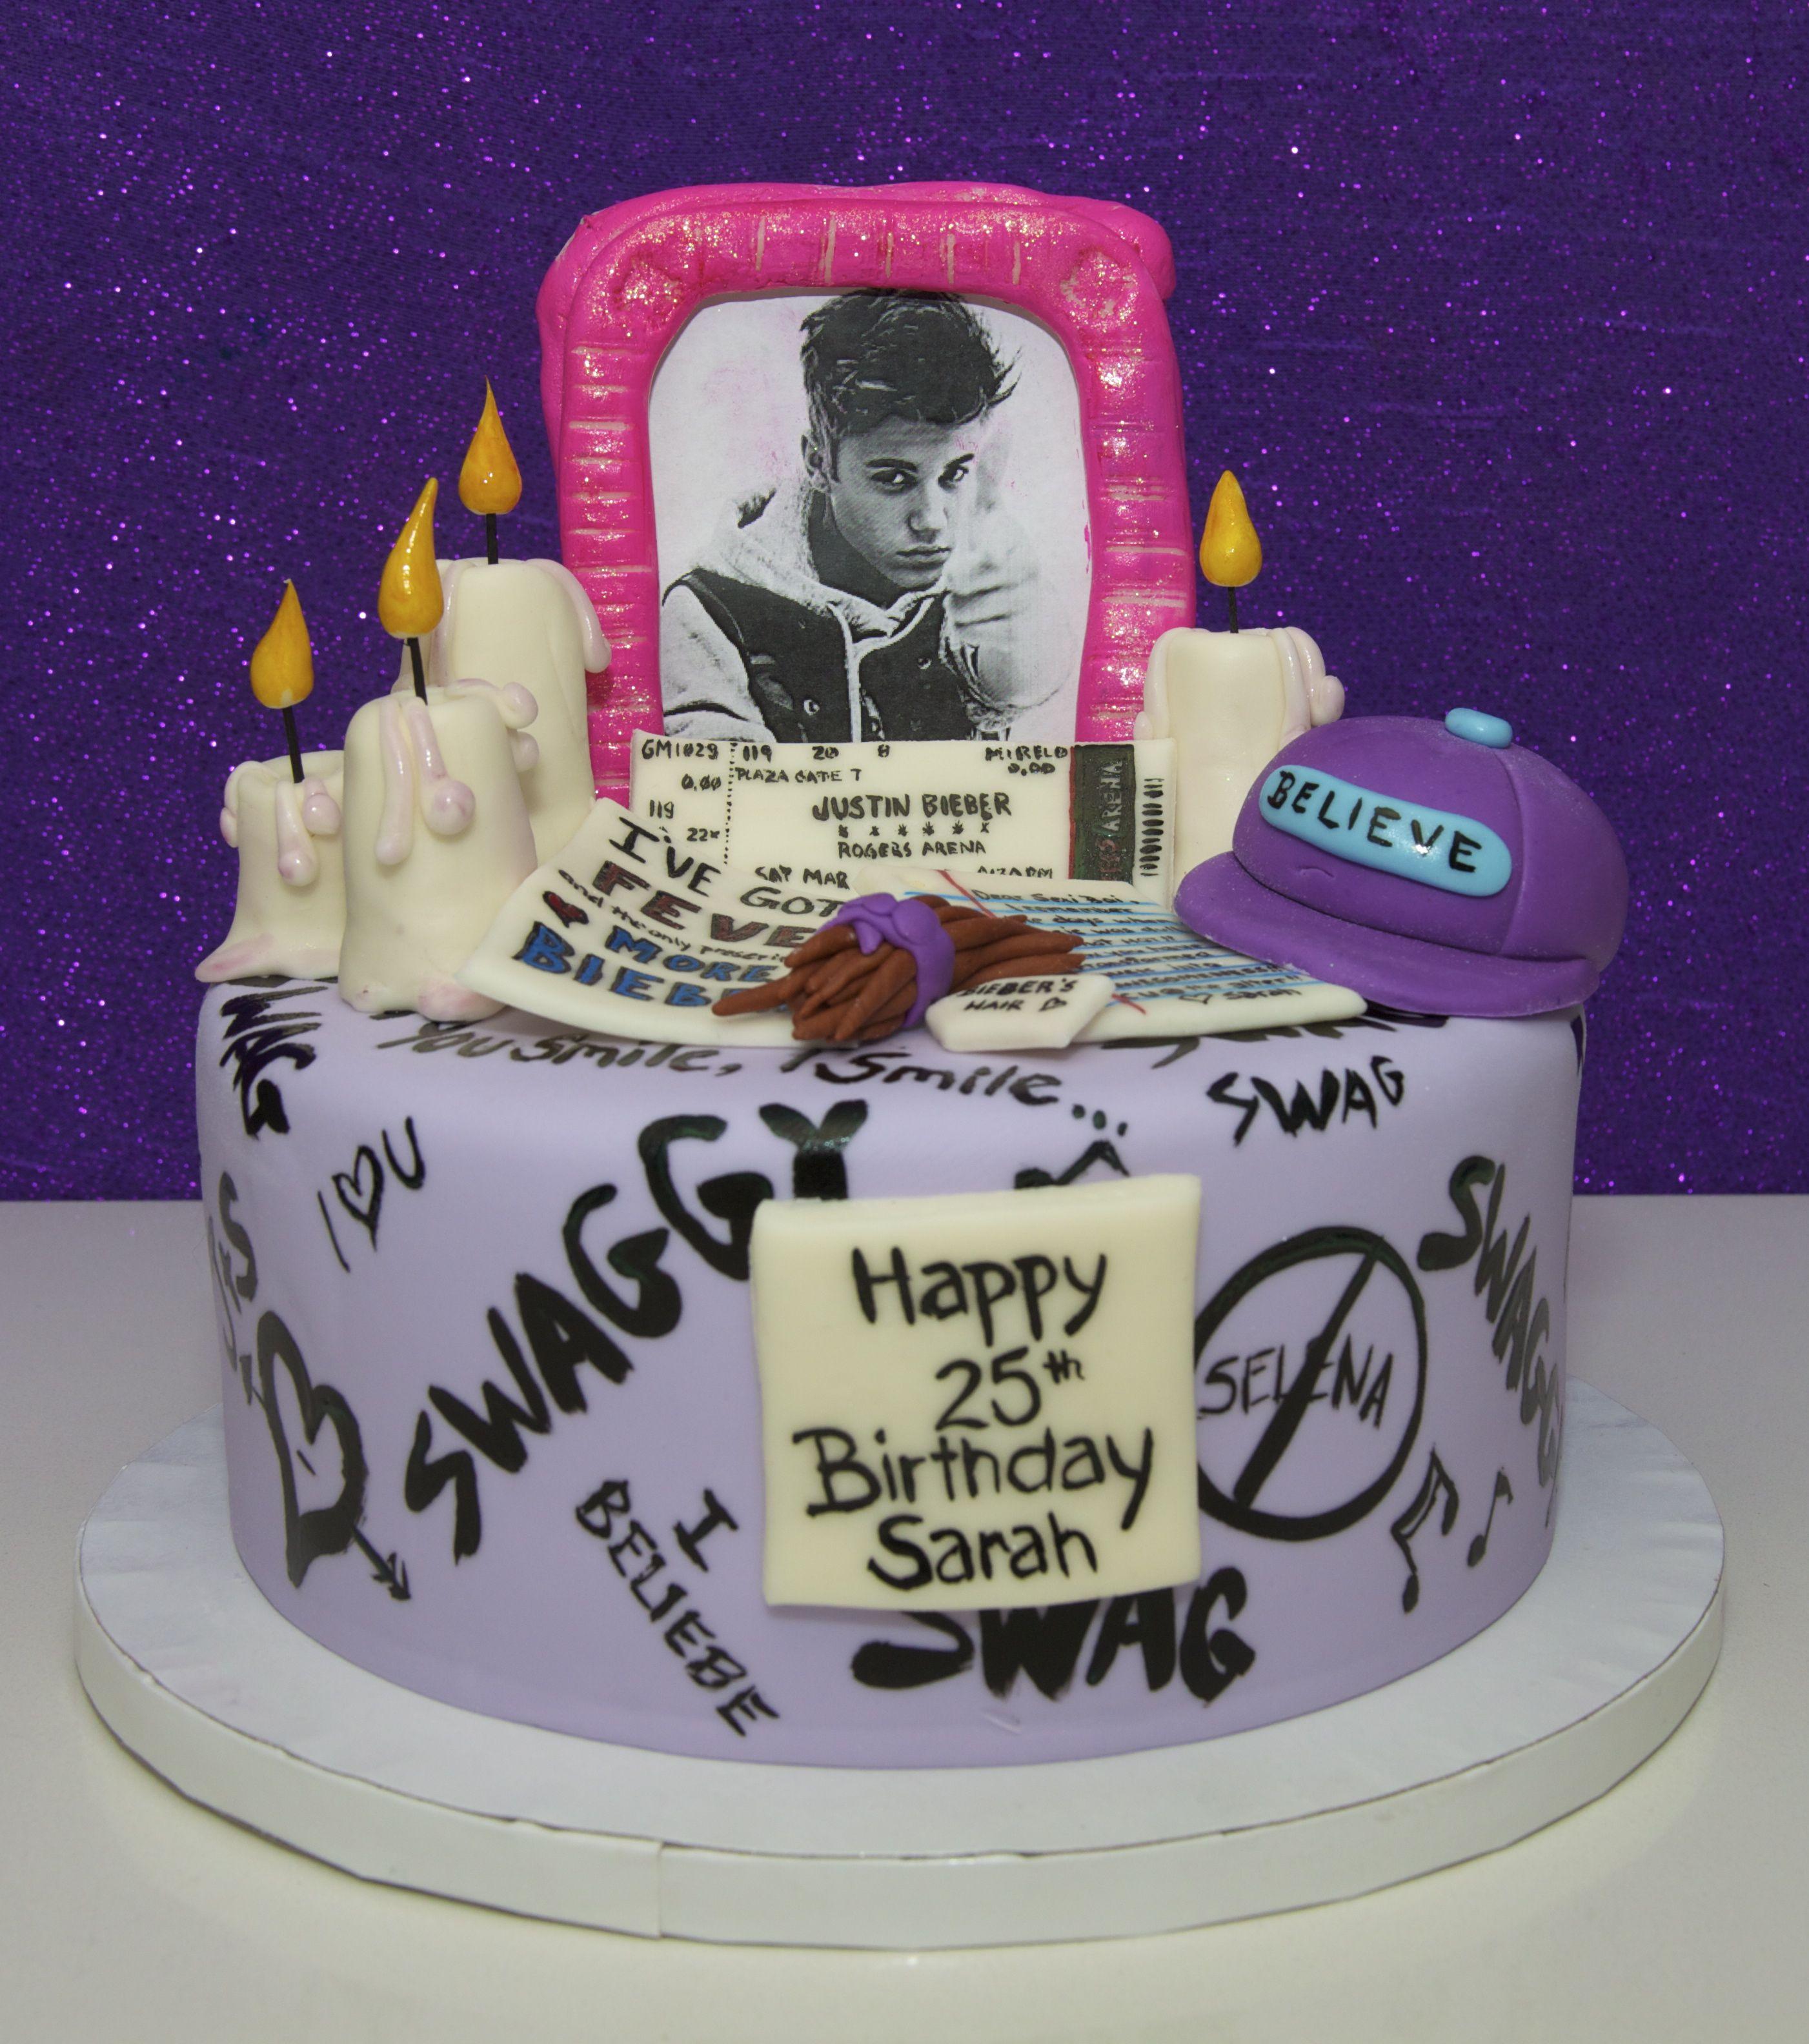 Stupendous Justin Bieber Cake With Images Justin Bieber Cake Justin Funny Birthday Cards Online Elaedamsfinfo